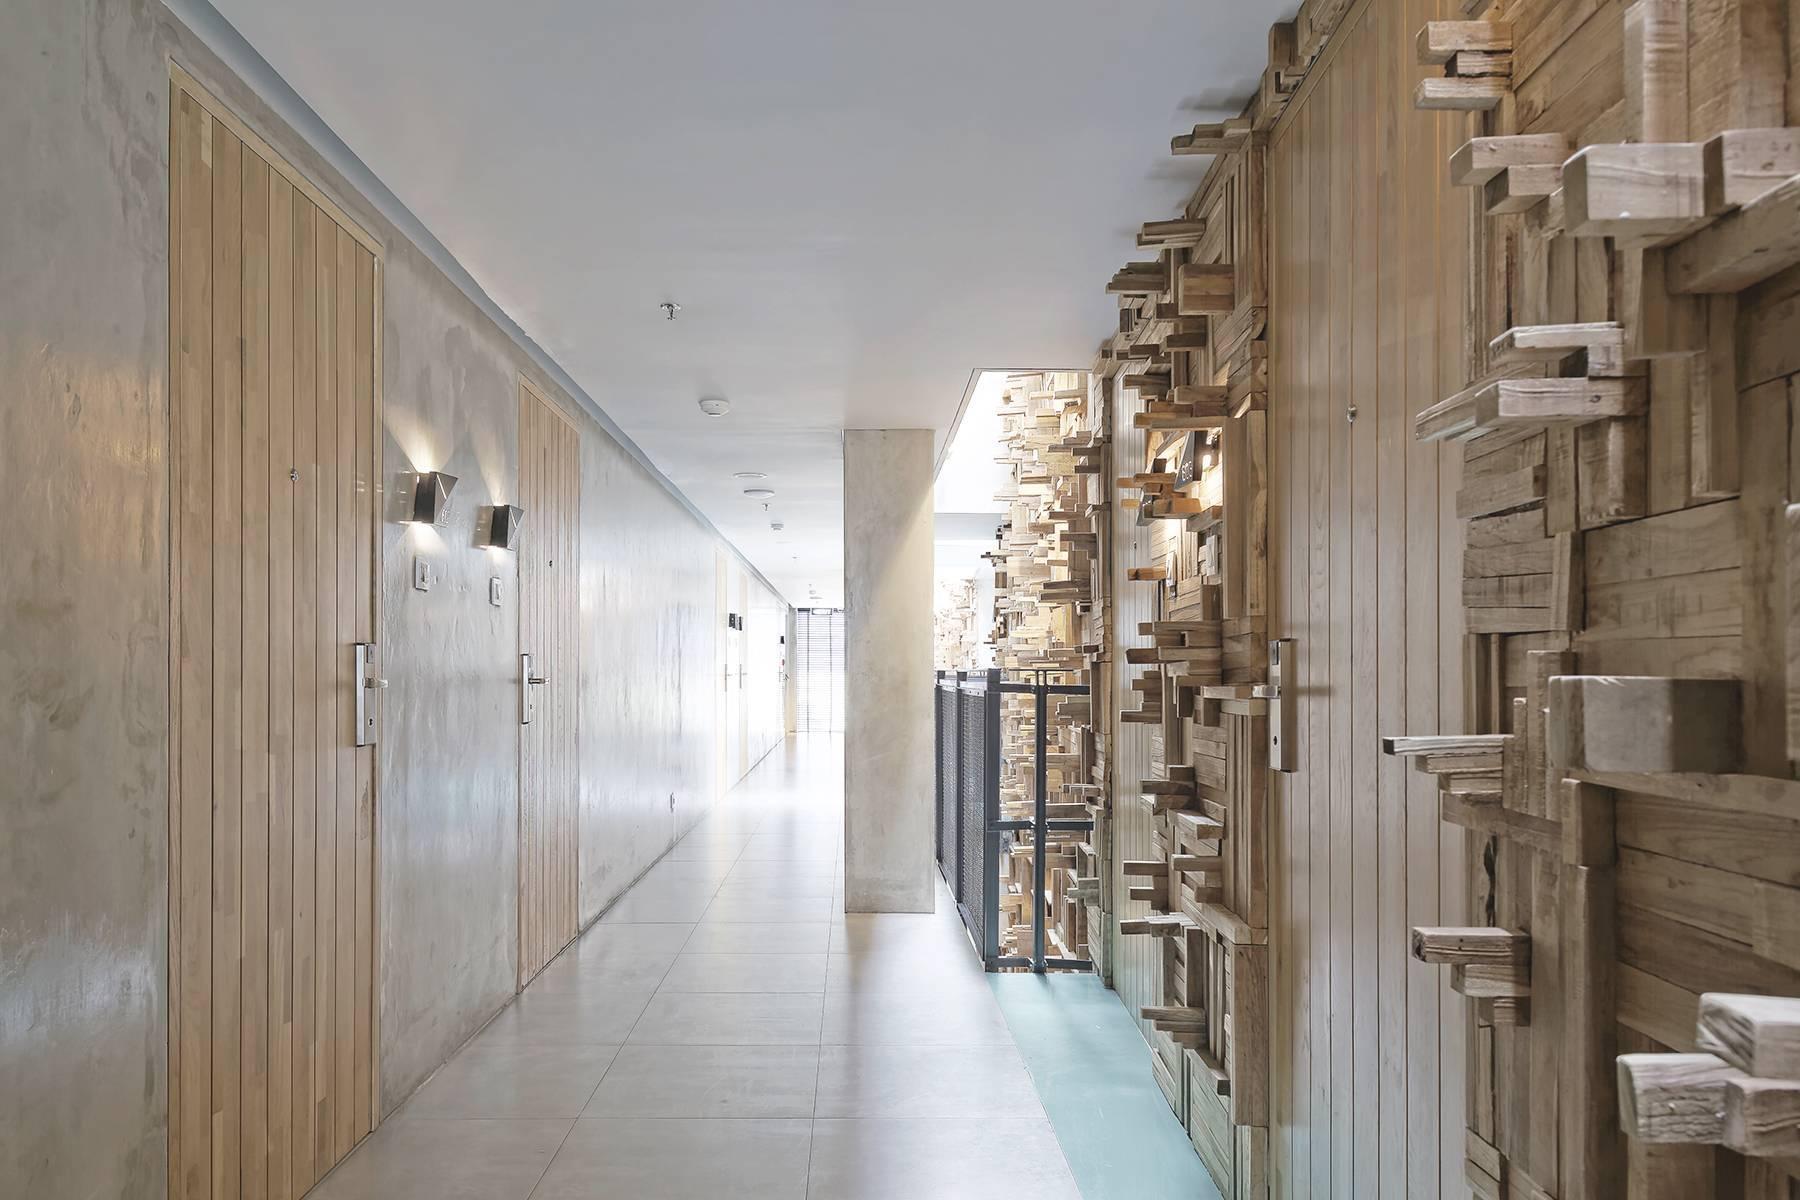 Antony Liu + Ferry Ridwan / Studio Tonton Kosenda Hotel Jl. Wahid Hasyim, Jakarta Jl. Wahid Hasyim, Jakarta Corridor Room Modern  7941